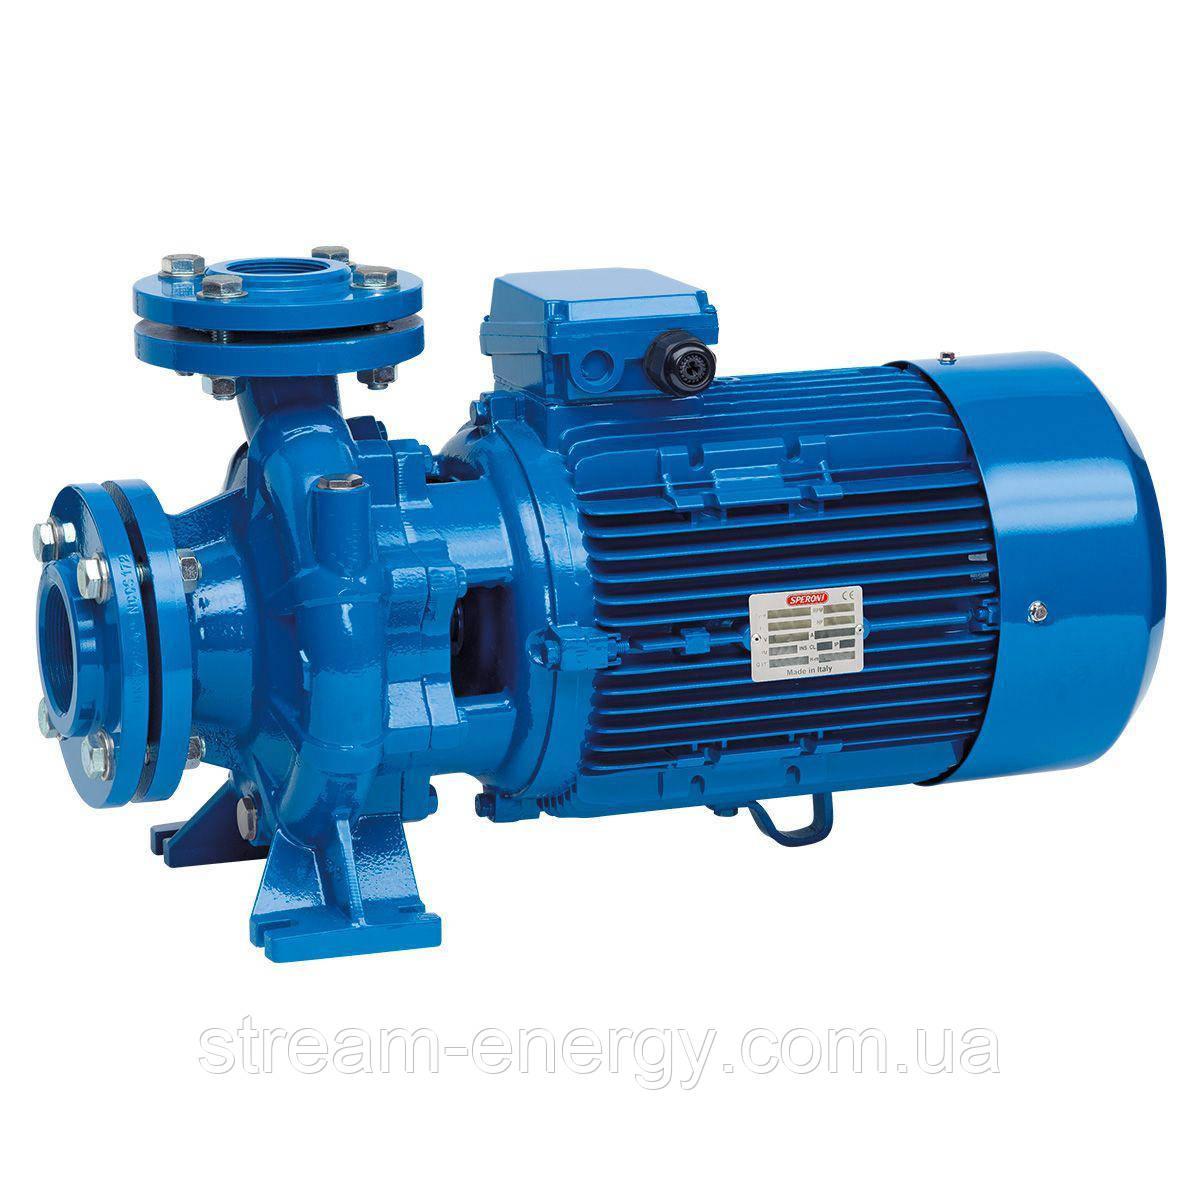 Моноблочный центробежный насос Speroni CS 65-160A, подача до 144м3/ч